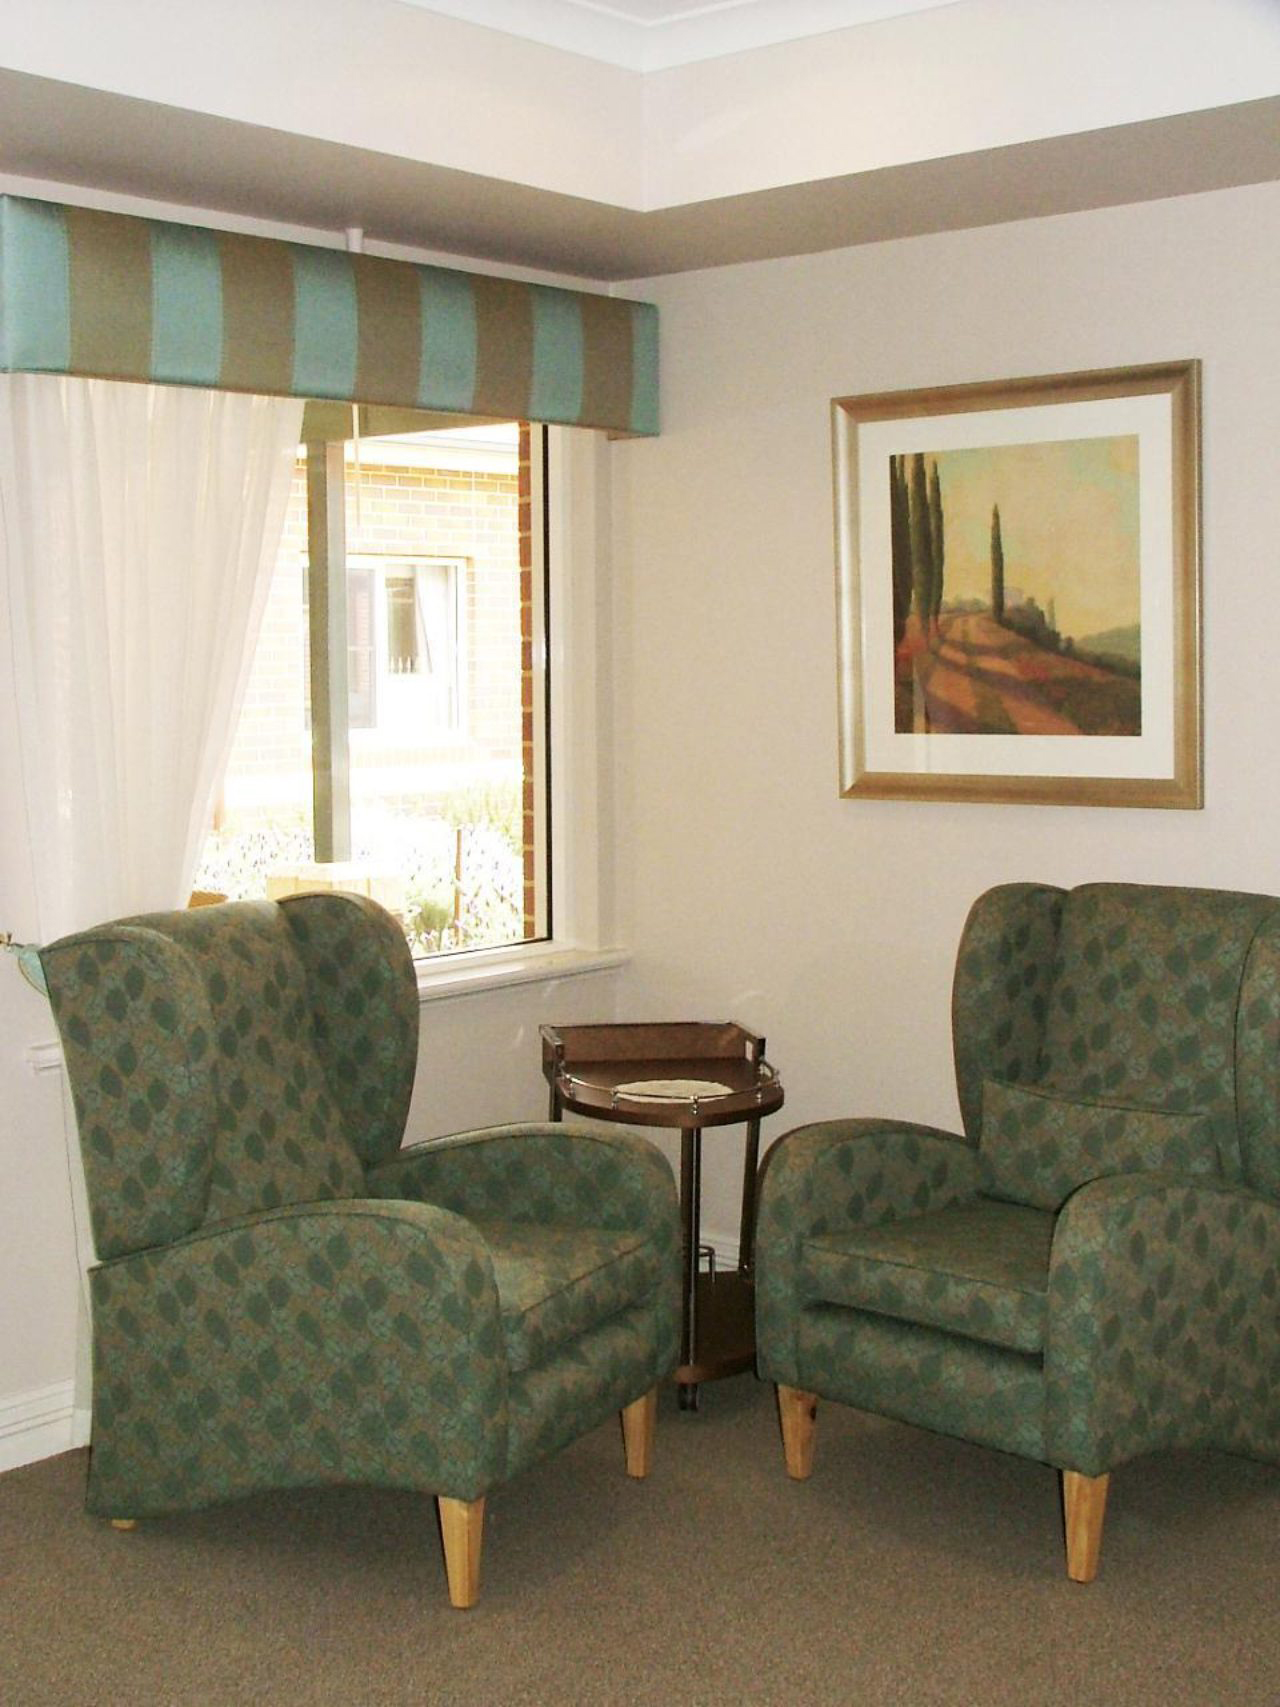 Juniper Annesley Residential Care, Bentley WA 6102 - Juniper Annesley Residential Care